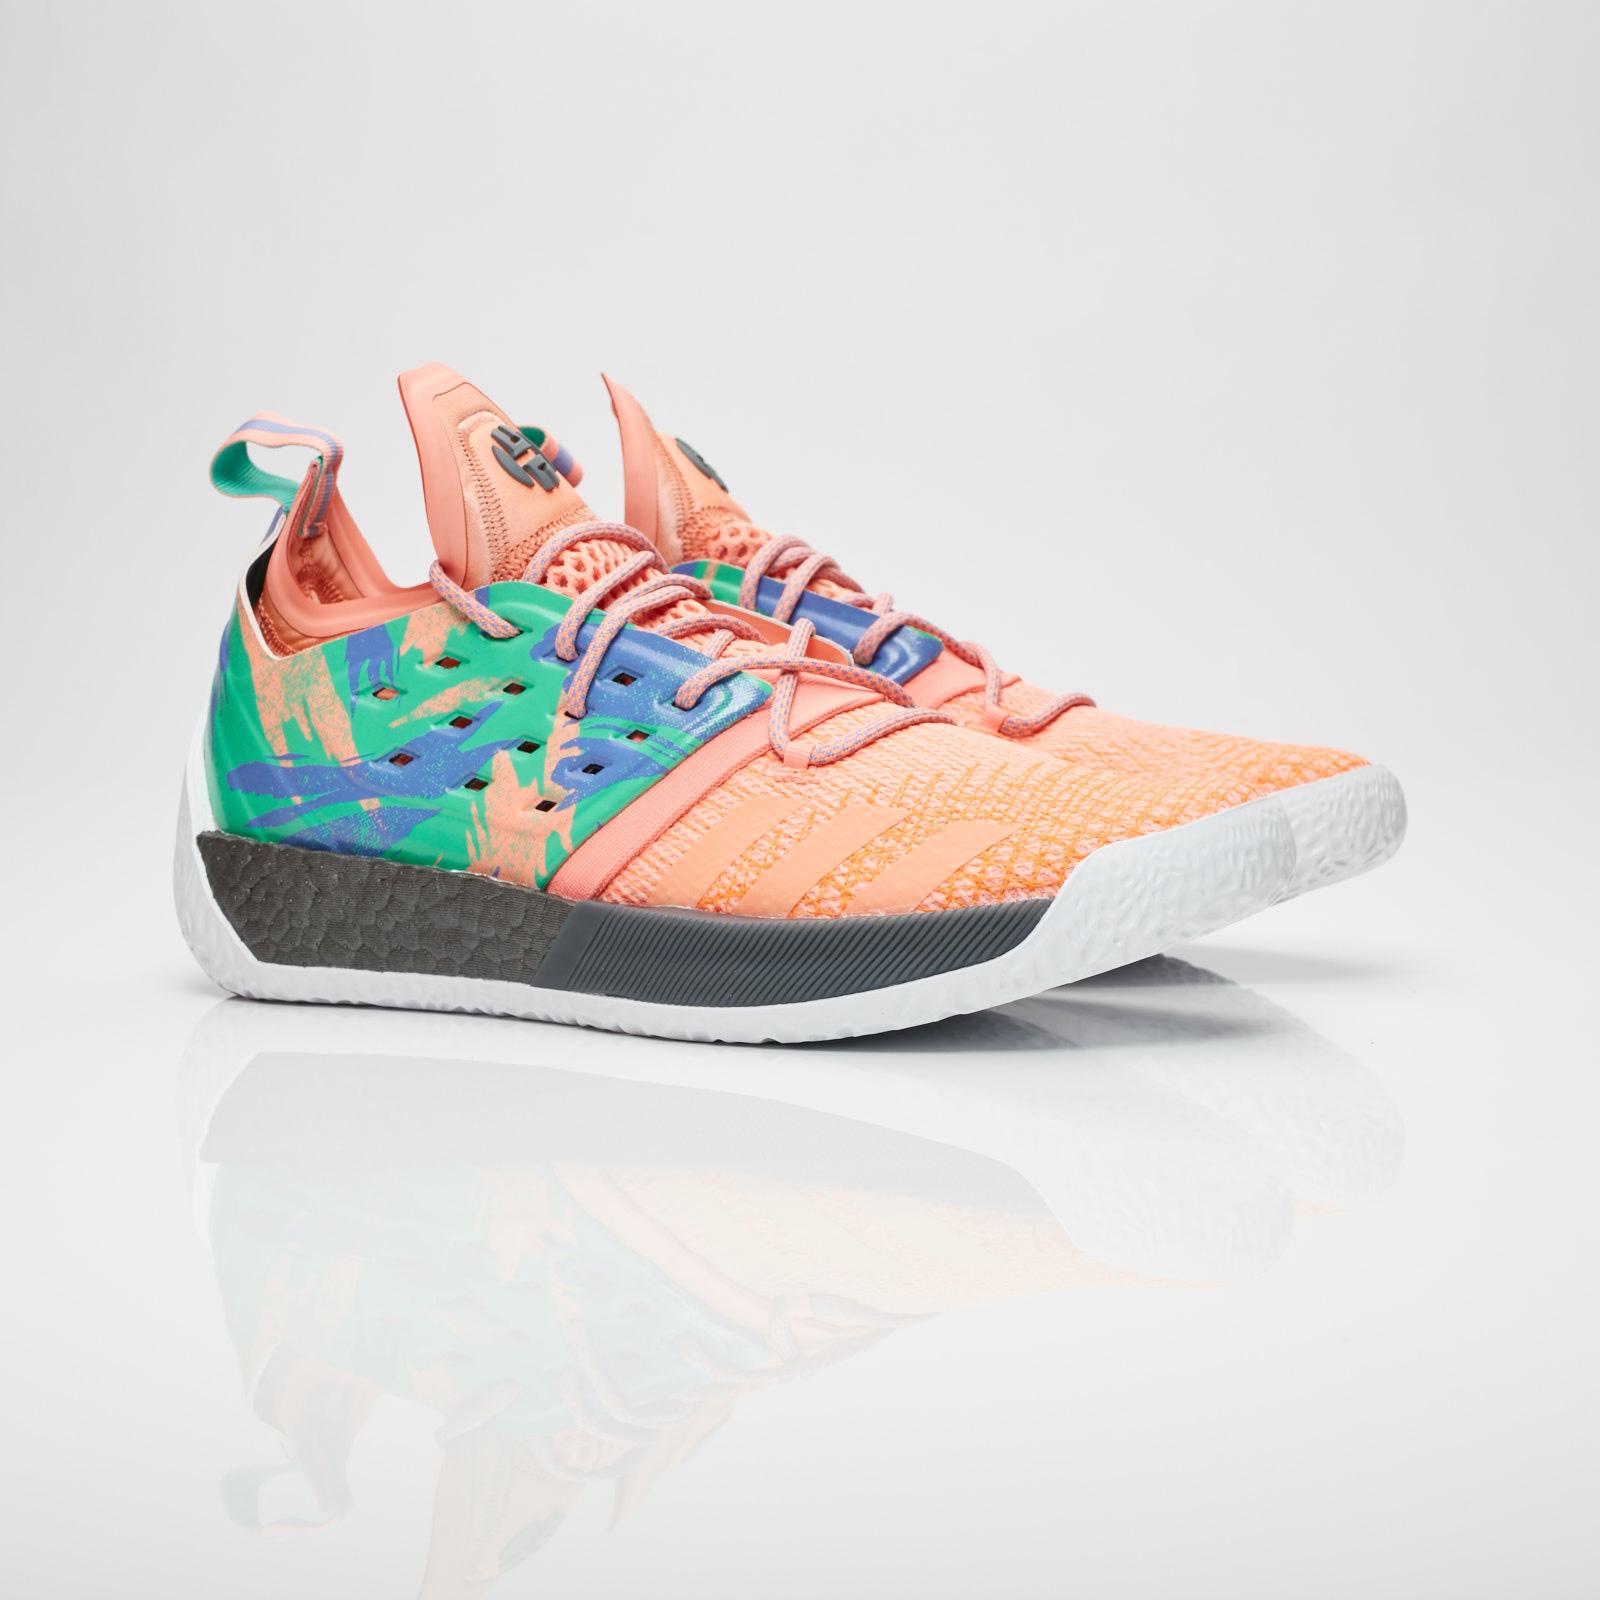 e08f791478f adidas Harden Vol. 2 - Ah2219 - Sneakersnstuff